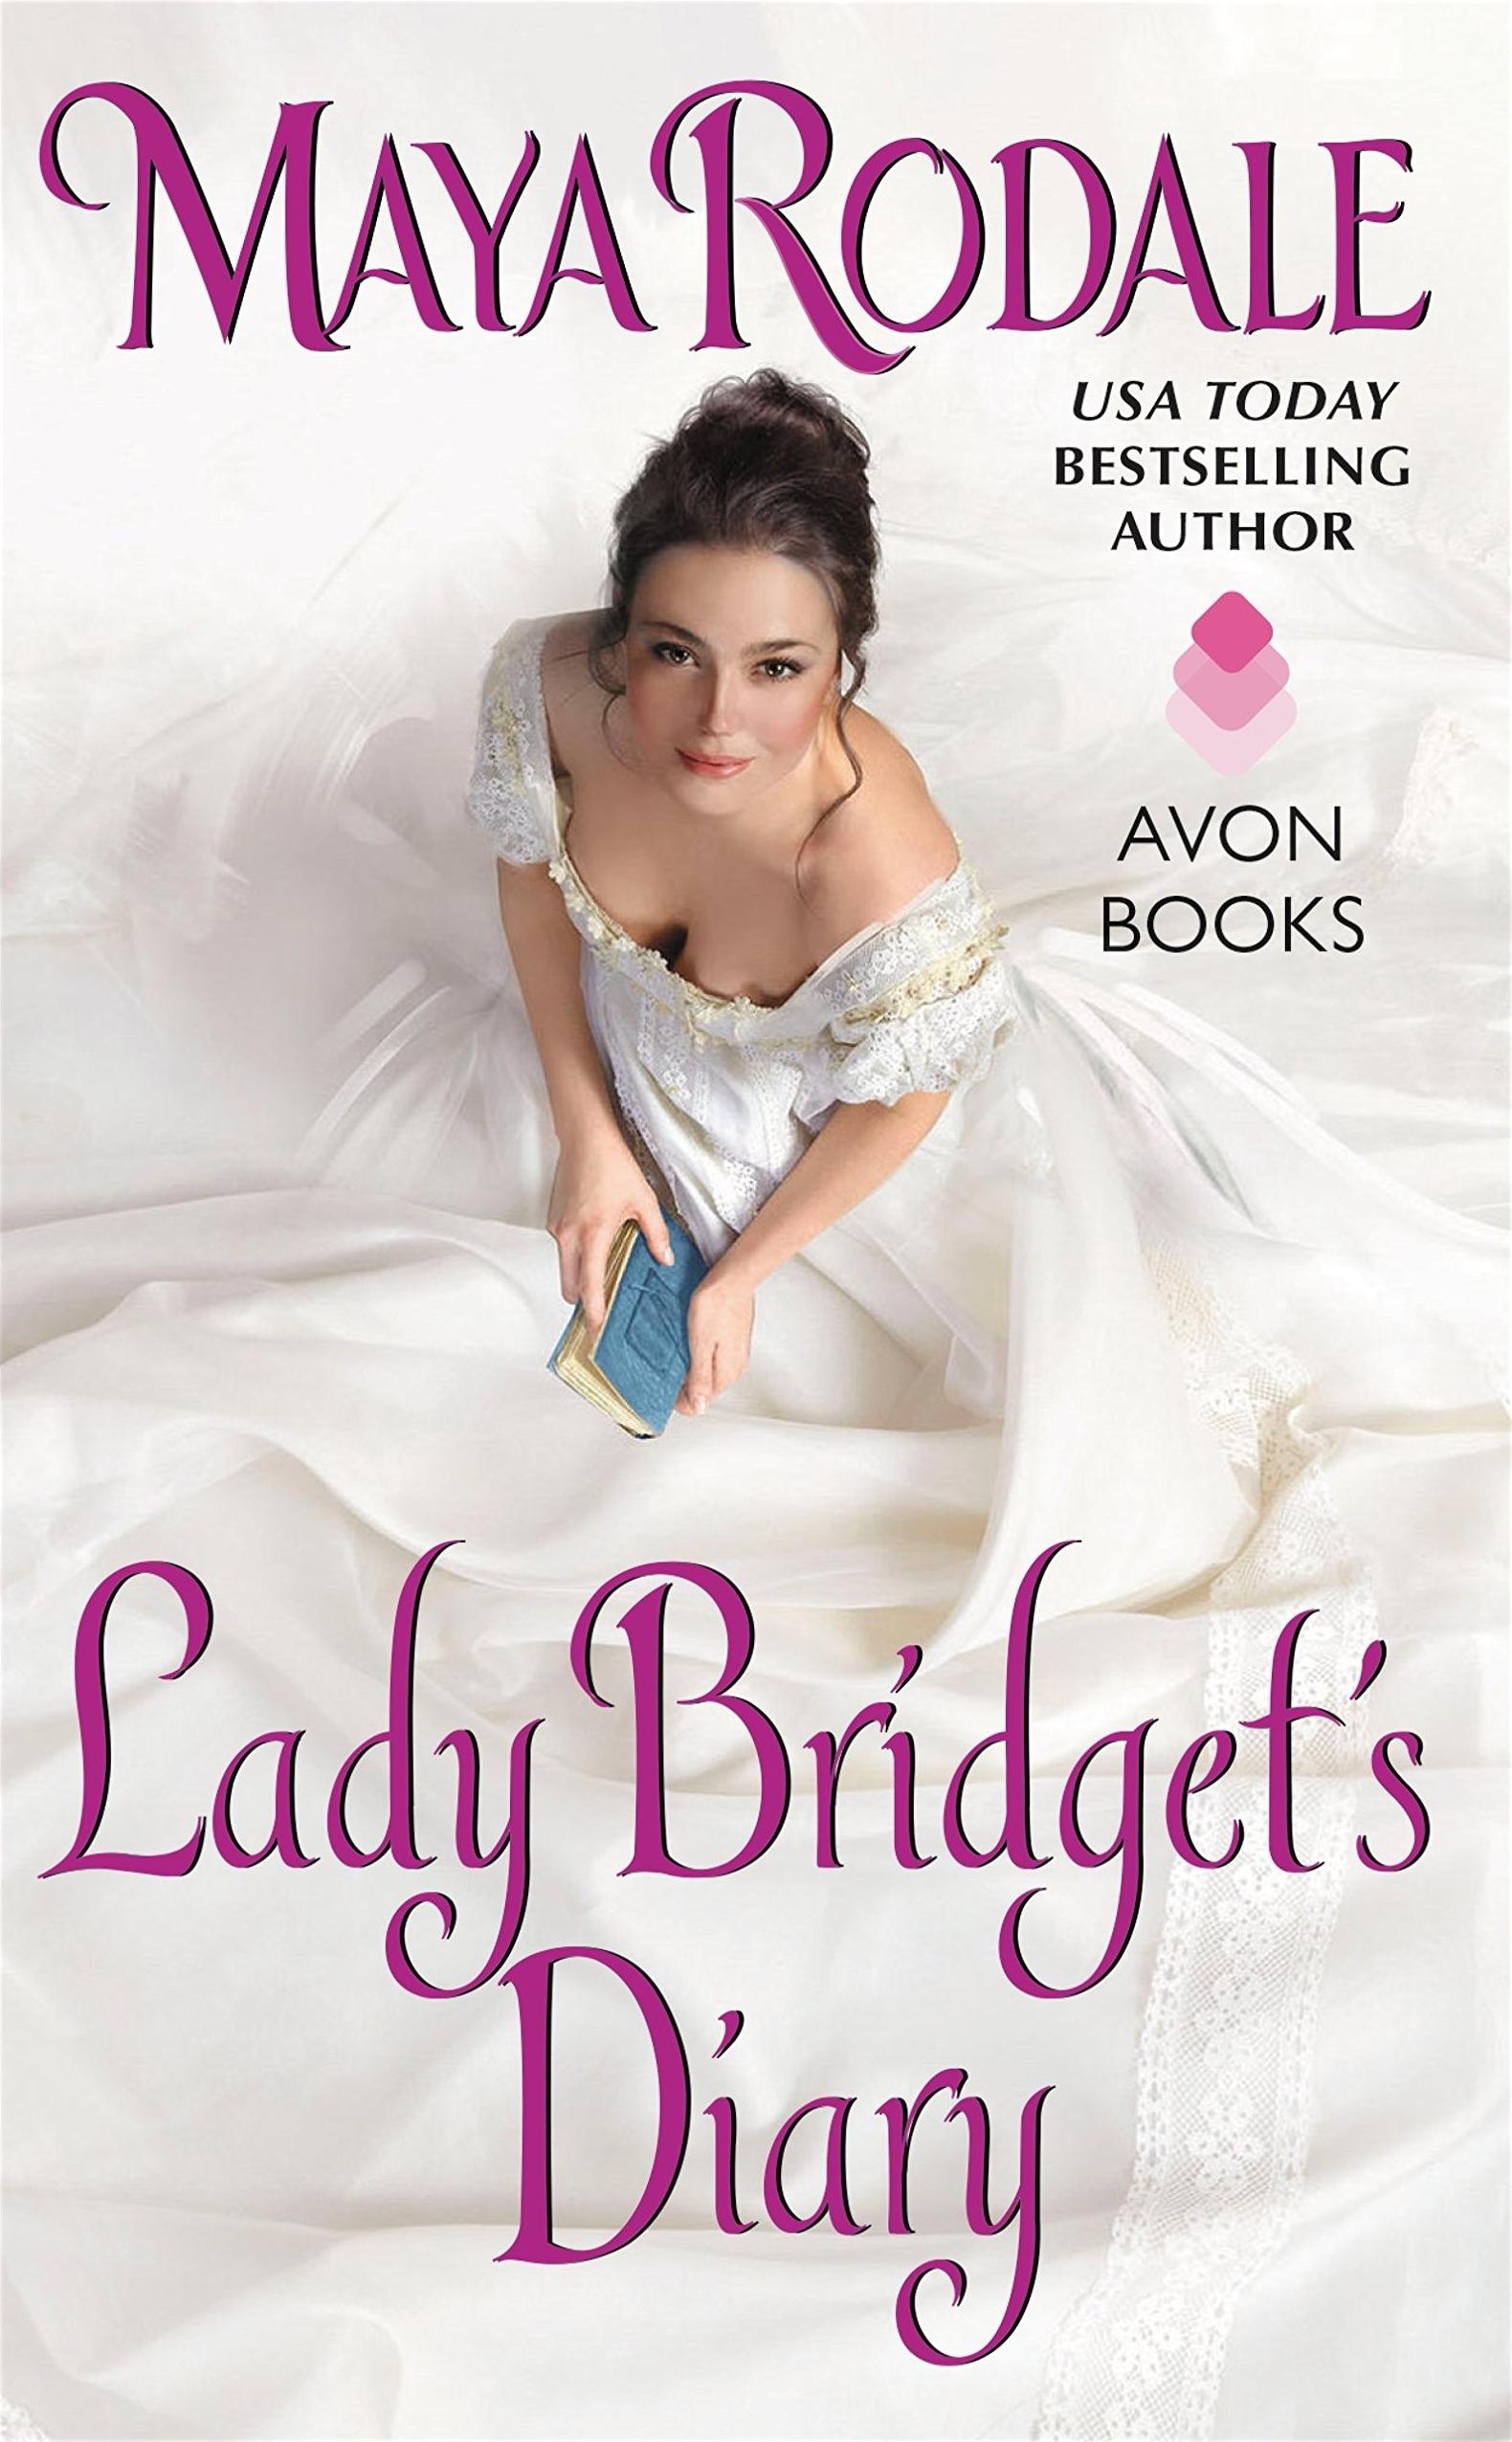 Lady Bridgets Diary (Cavendish, #1) Maya Rodale